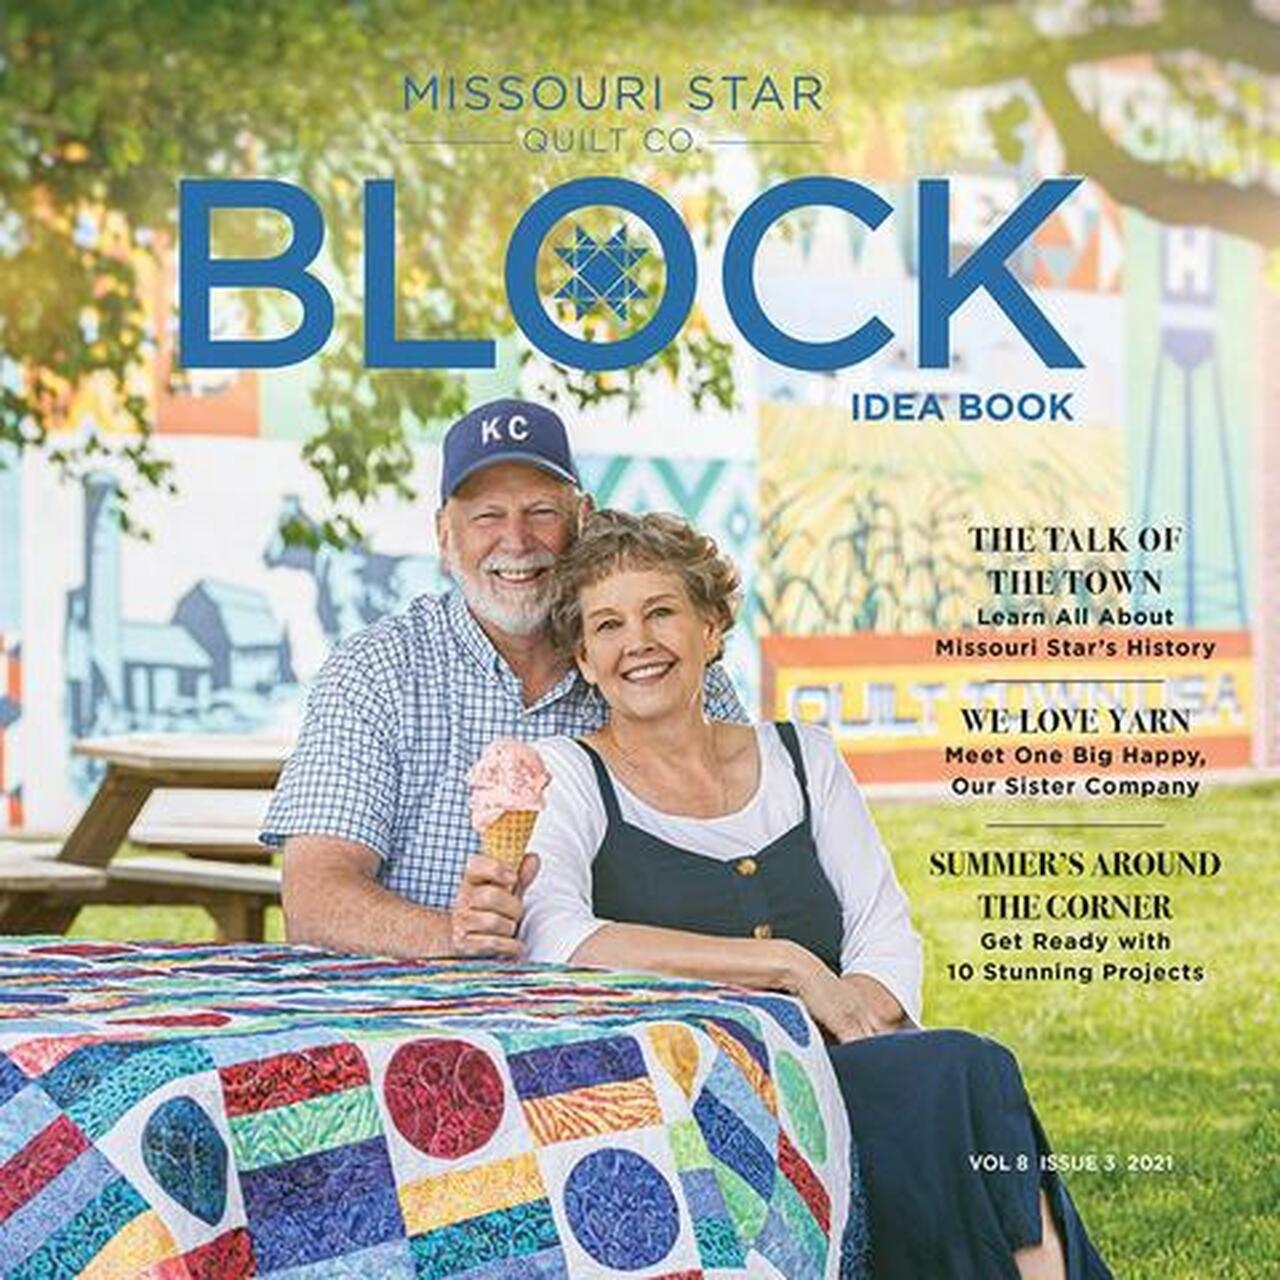 BLOCK Idea Book ~ Vol 8 Issue 3 2021